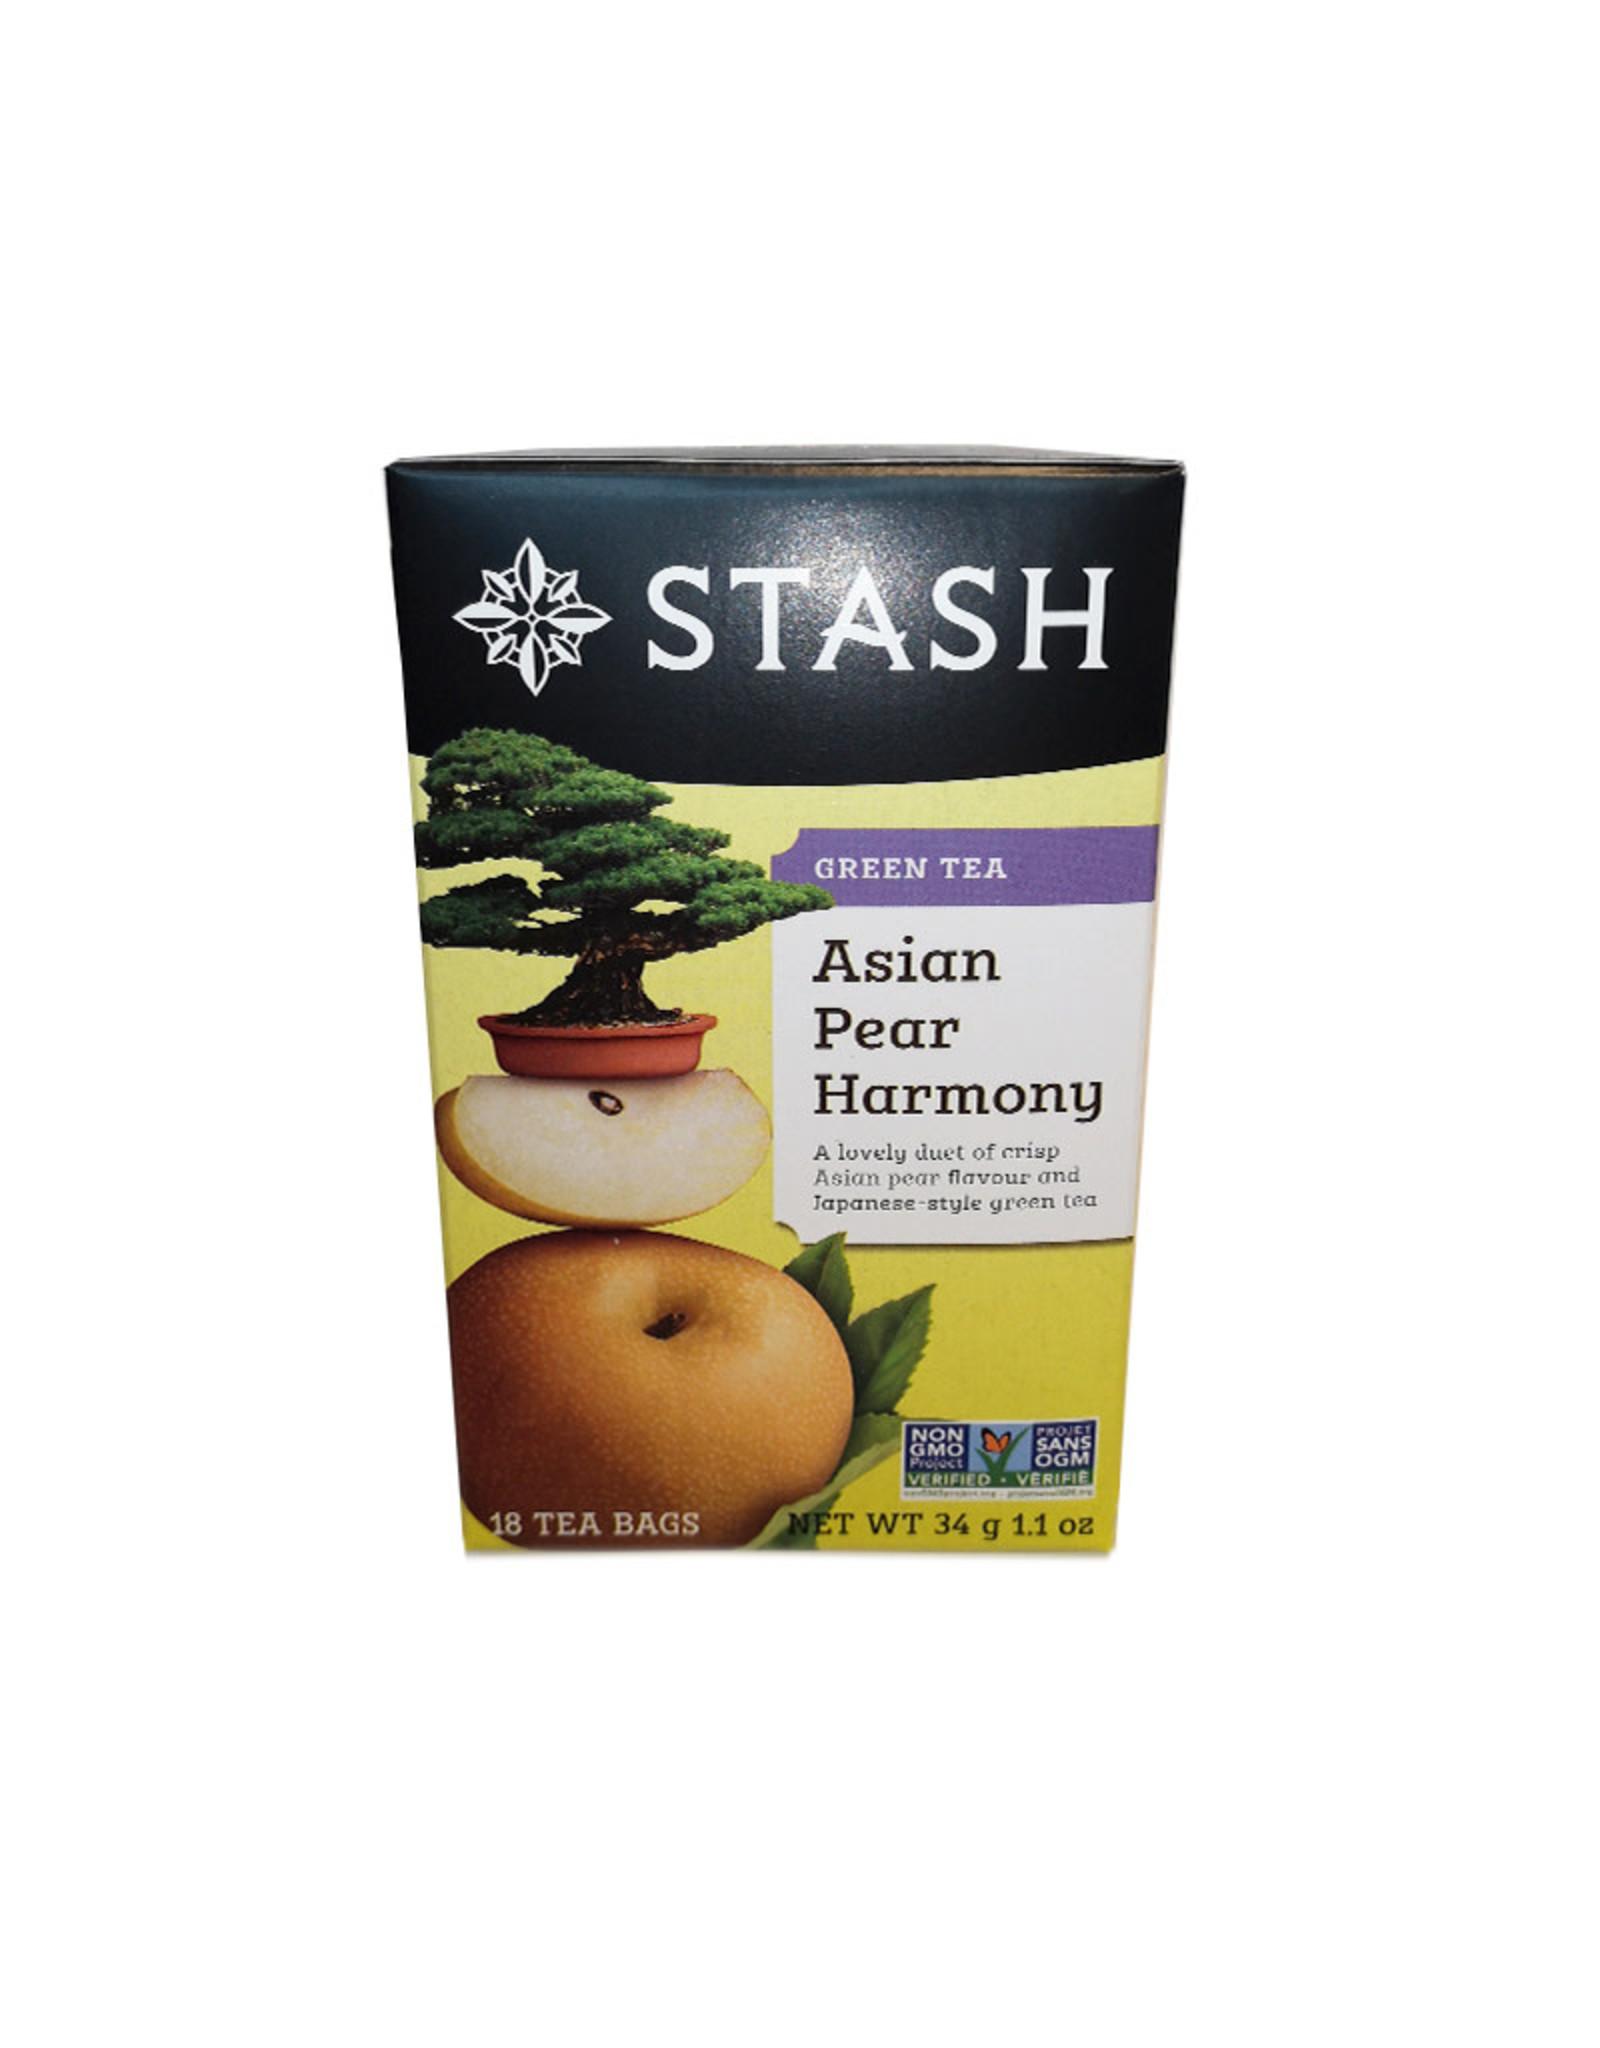 Stash Stash - Tea, Asian Pear Harmony (18bg)